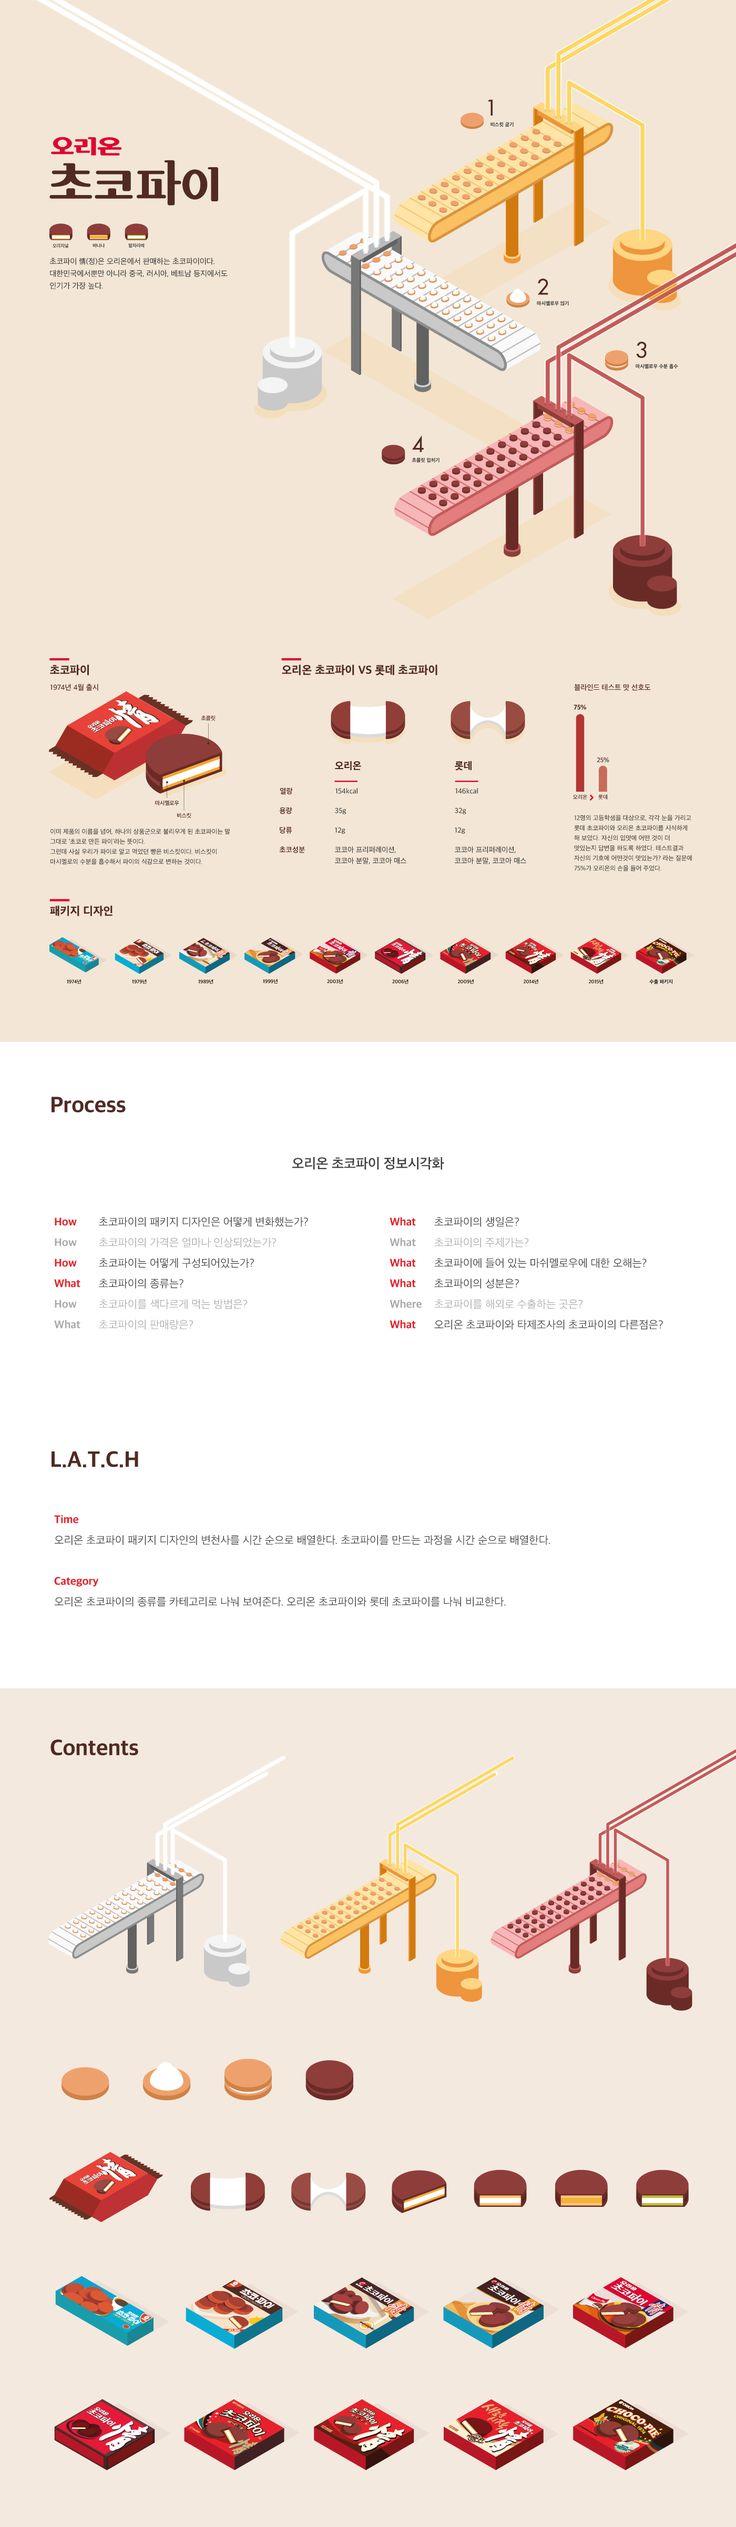 Hyesoo Yoon   Orion Choco Pie Infographic   Information Design 2016│ Major in Digital Media Design │#hicoda │hicoda.hongik.ac.kr